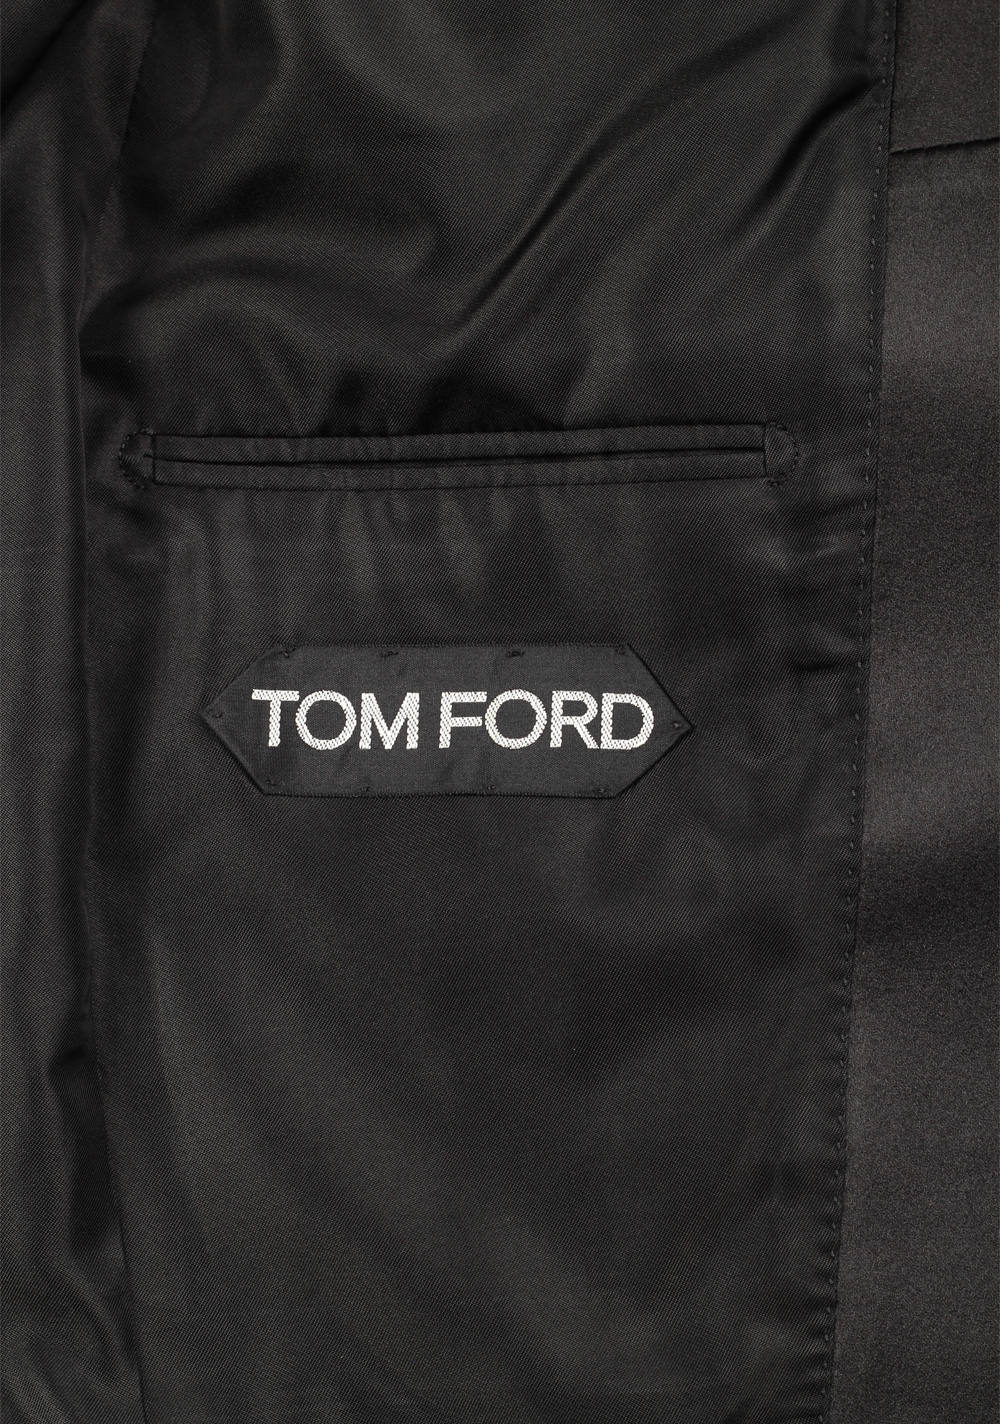 TOM FORD Atticus Black Tuxedo Smoking Suit Size 46C / 36S U.S. | Costume Limité